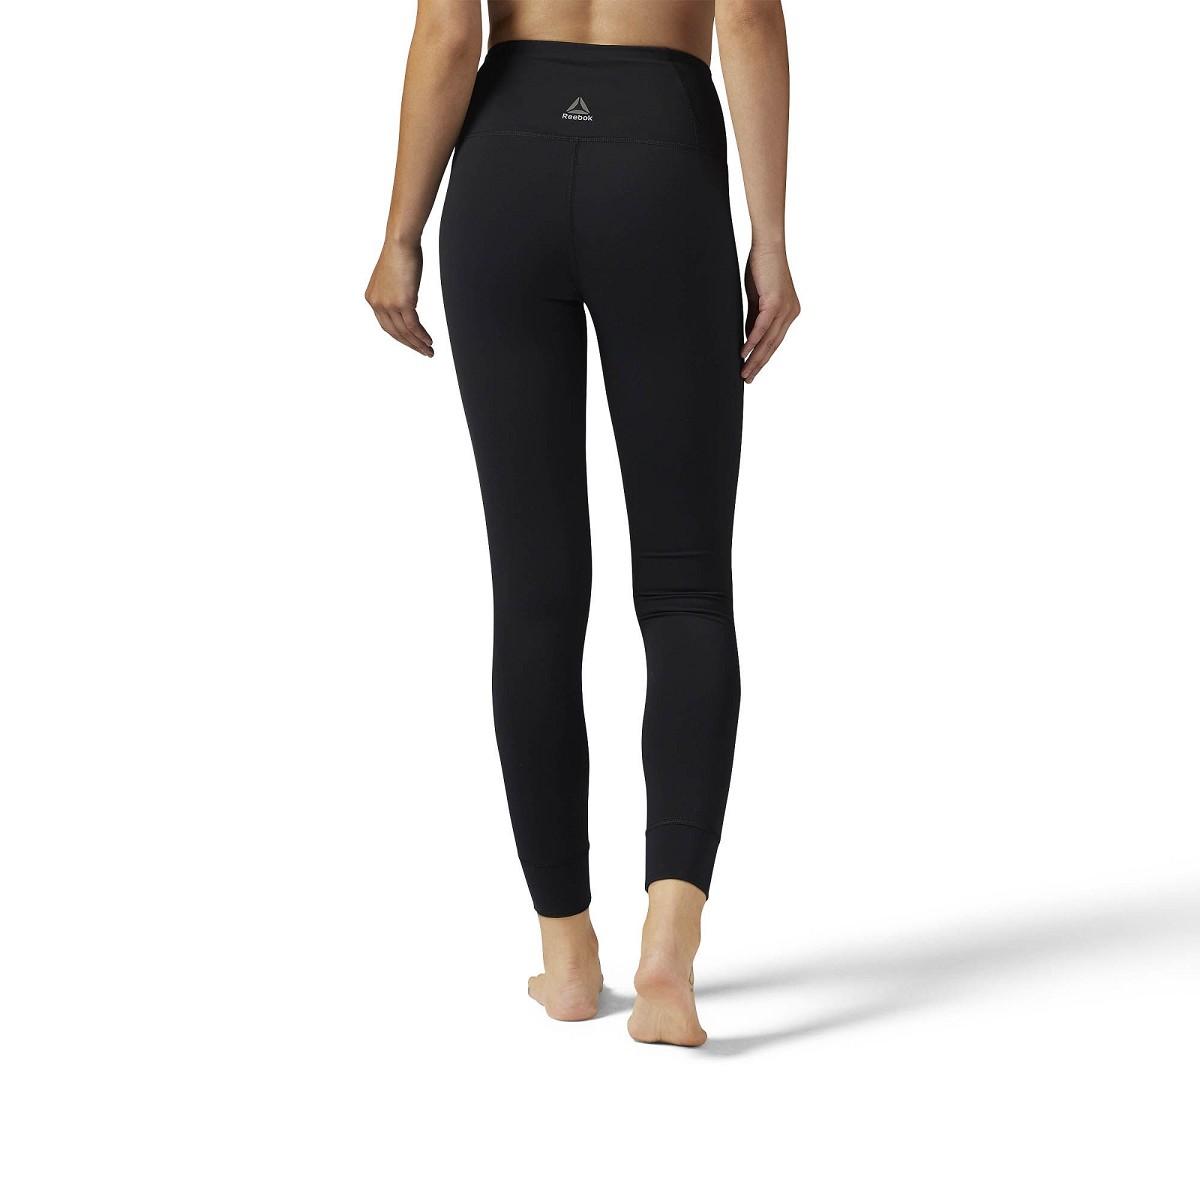 pantalone reebok crossfit br5244 leggings lux high rise nero pantaloni donna crossfit reebok. Black Bedroom Furniture Sets. Home Design Ideas